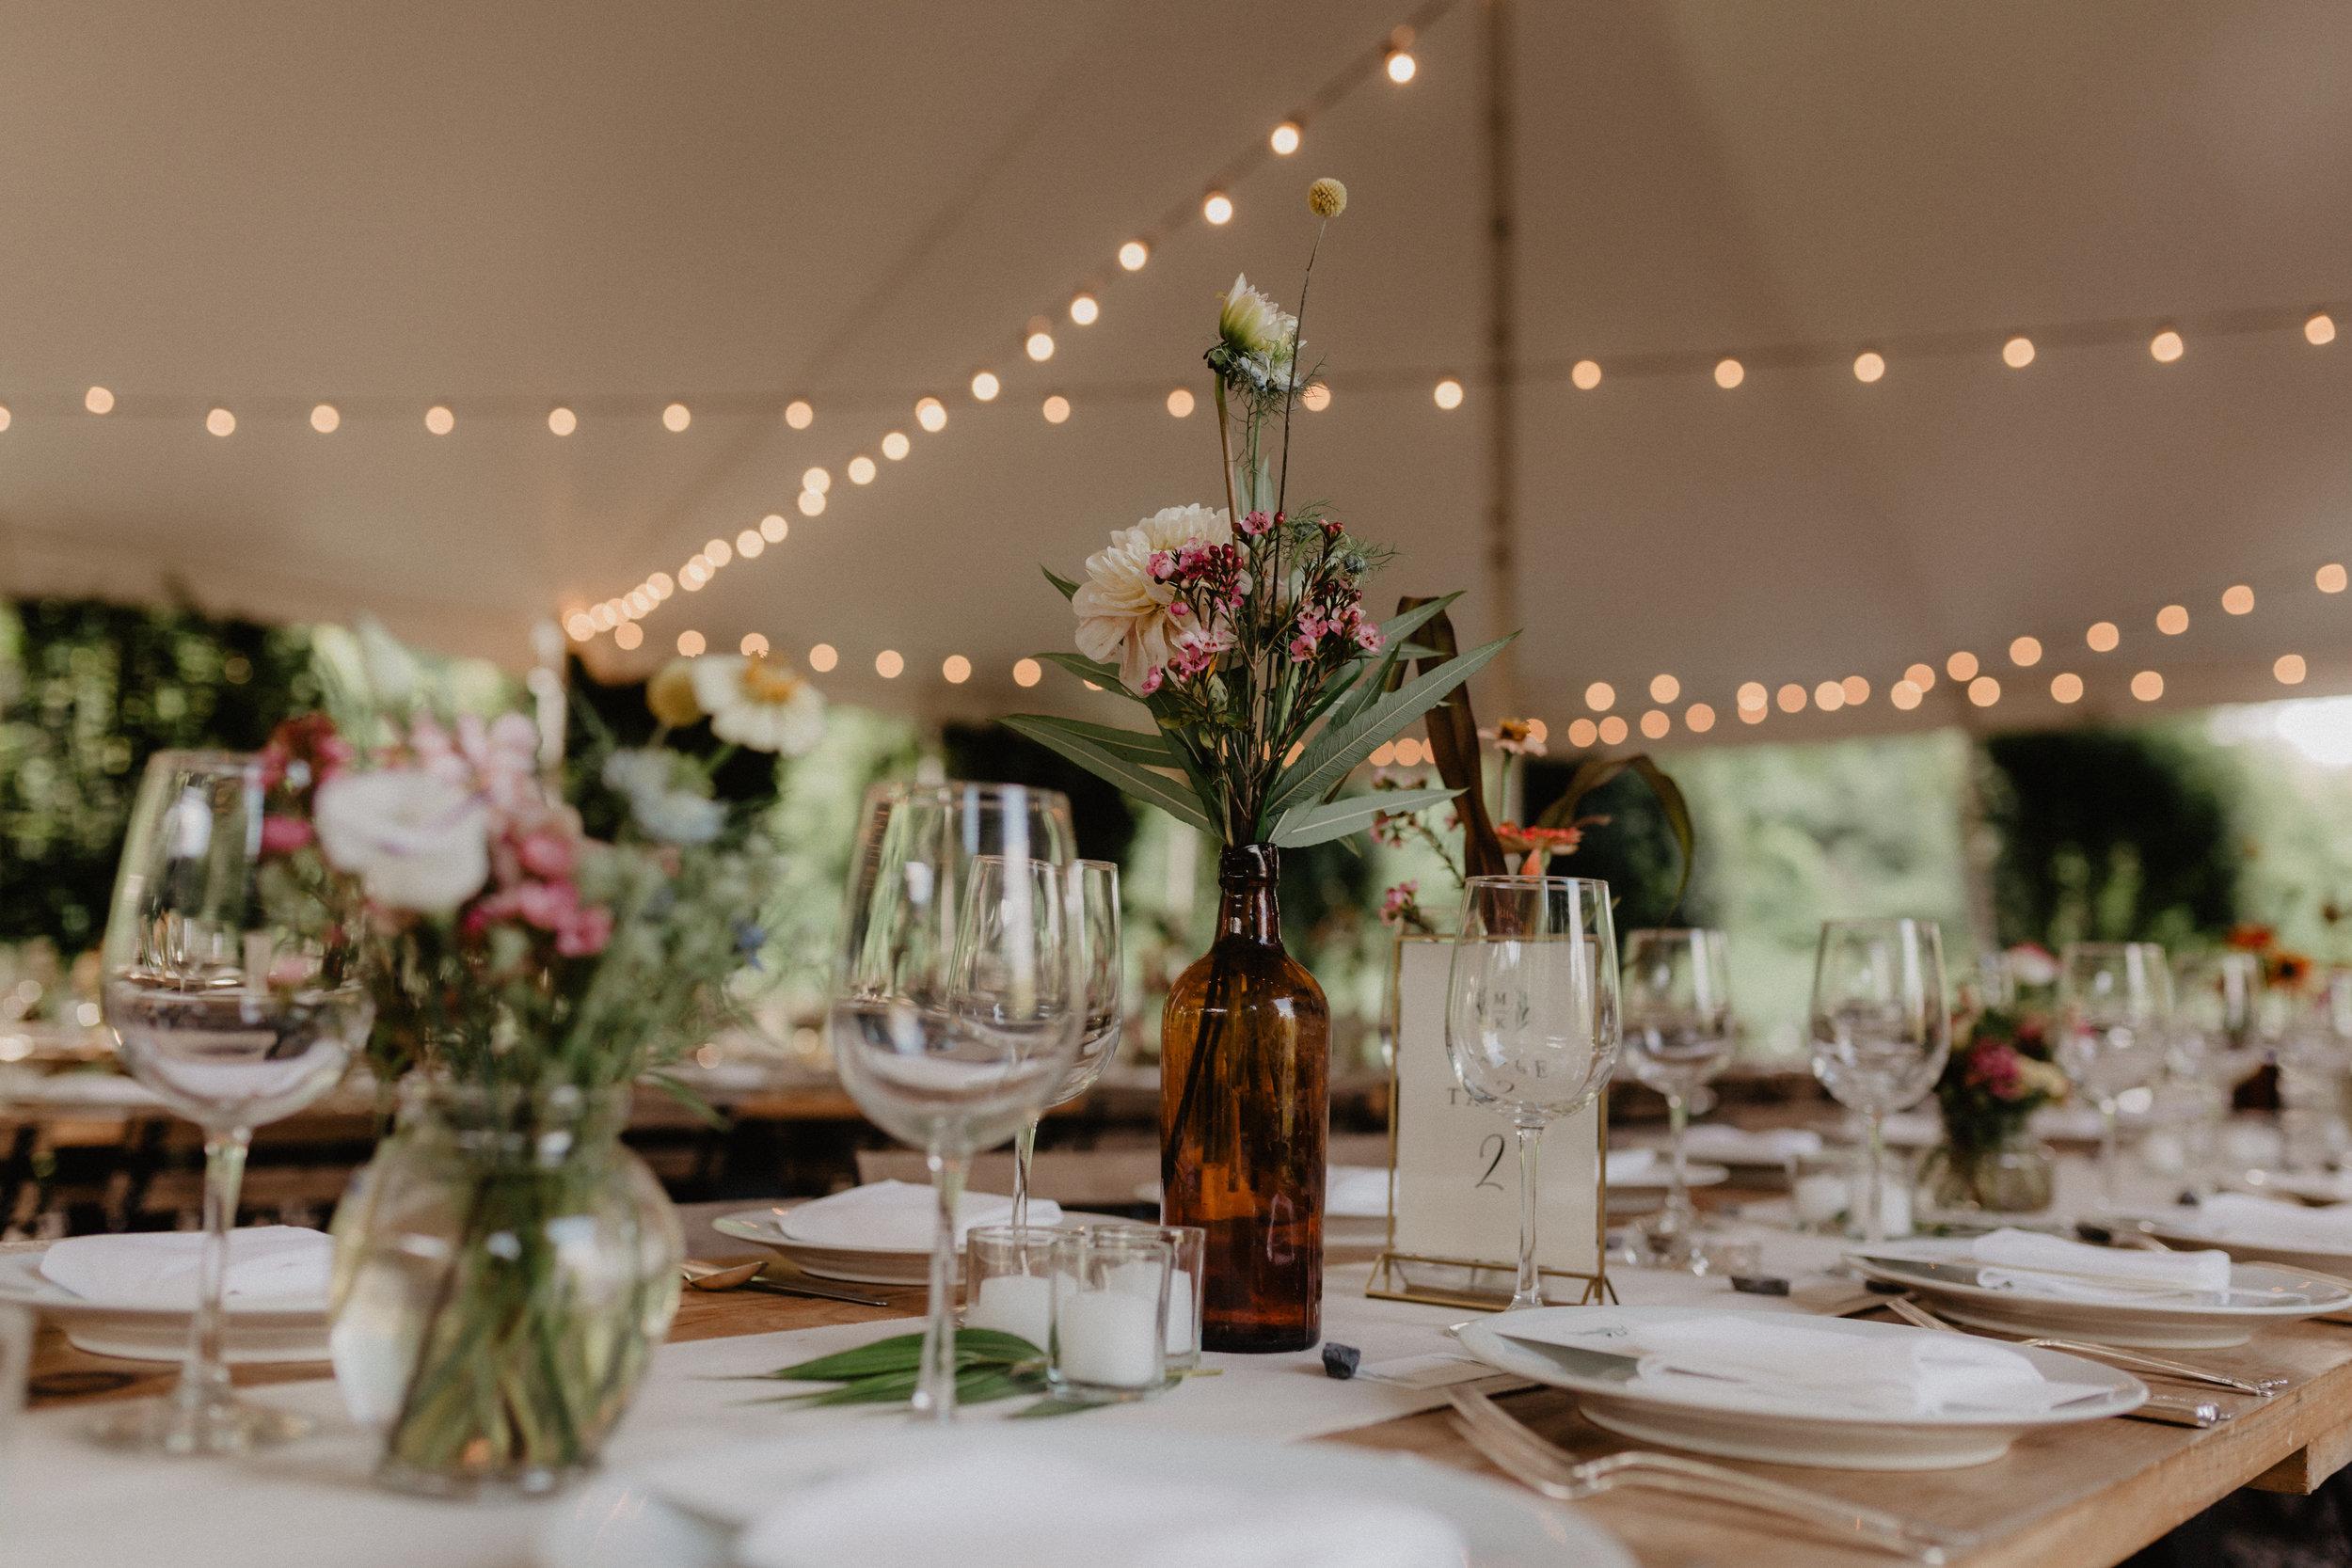 m-and-d-farm-wedding-82.jpg